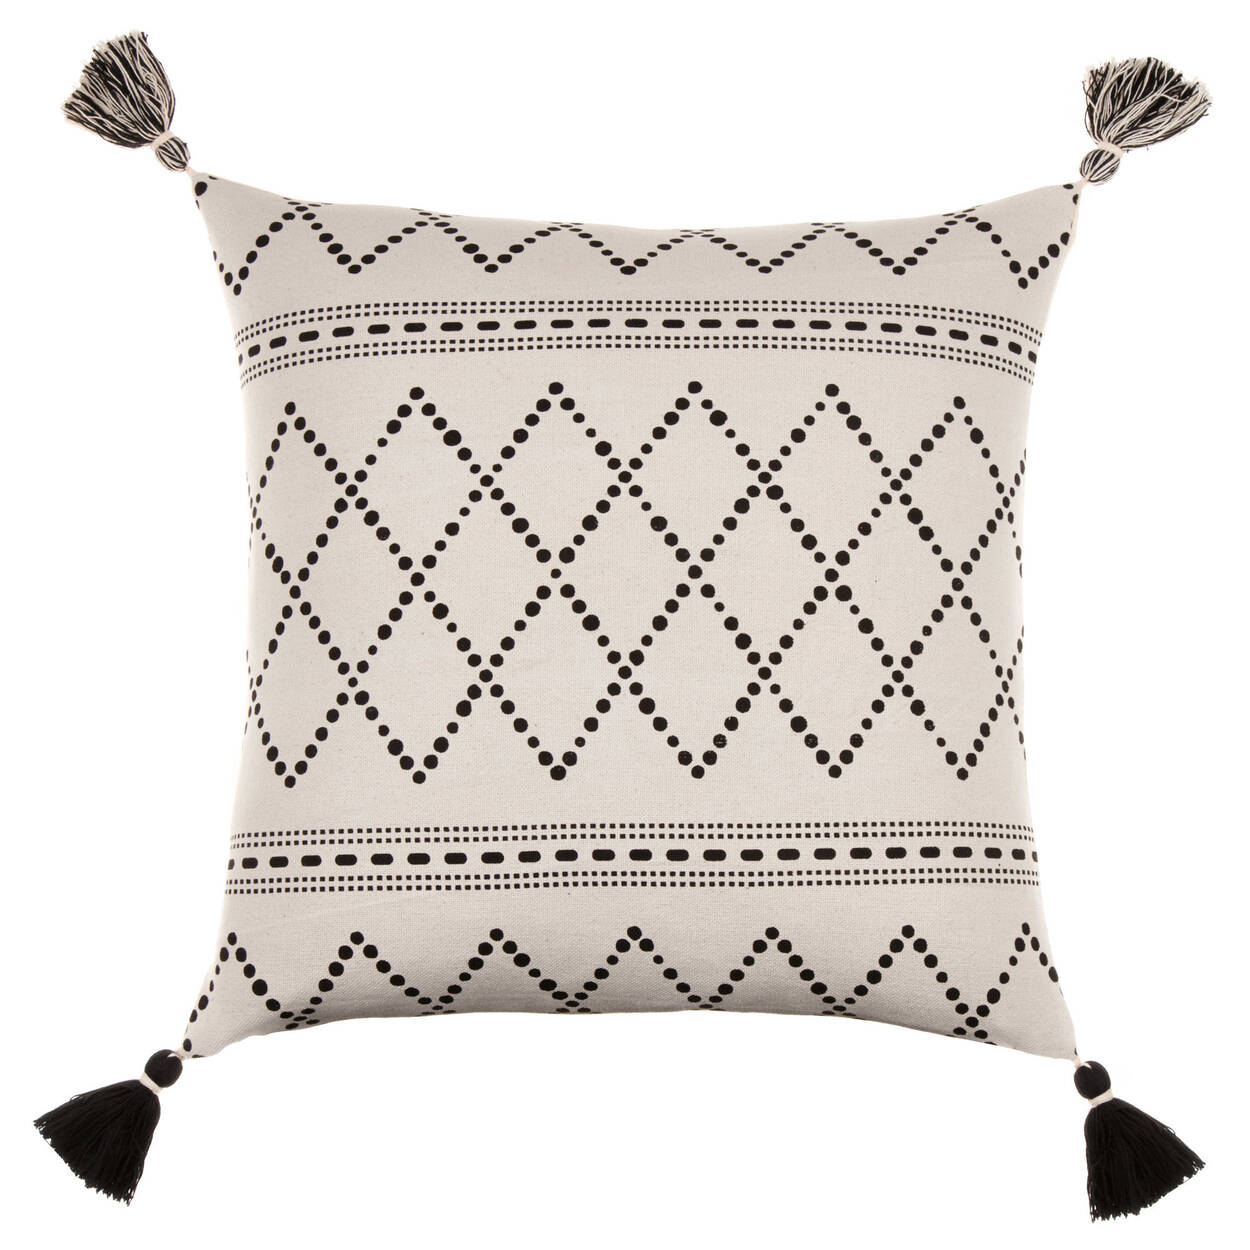 "Cora Decorative Pillow Cover with Pom-Poms 18"" X 18"""